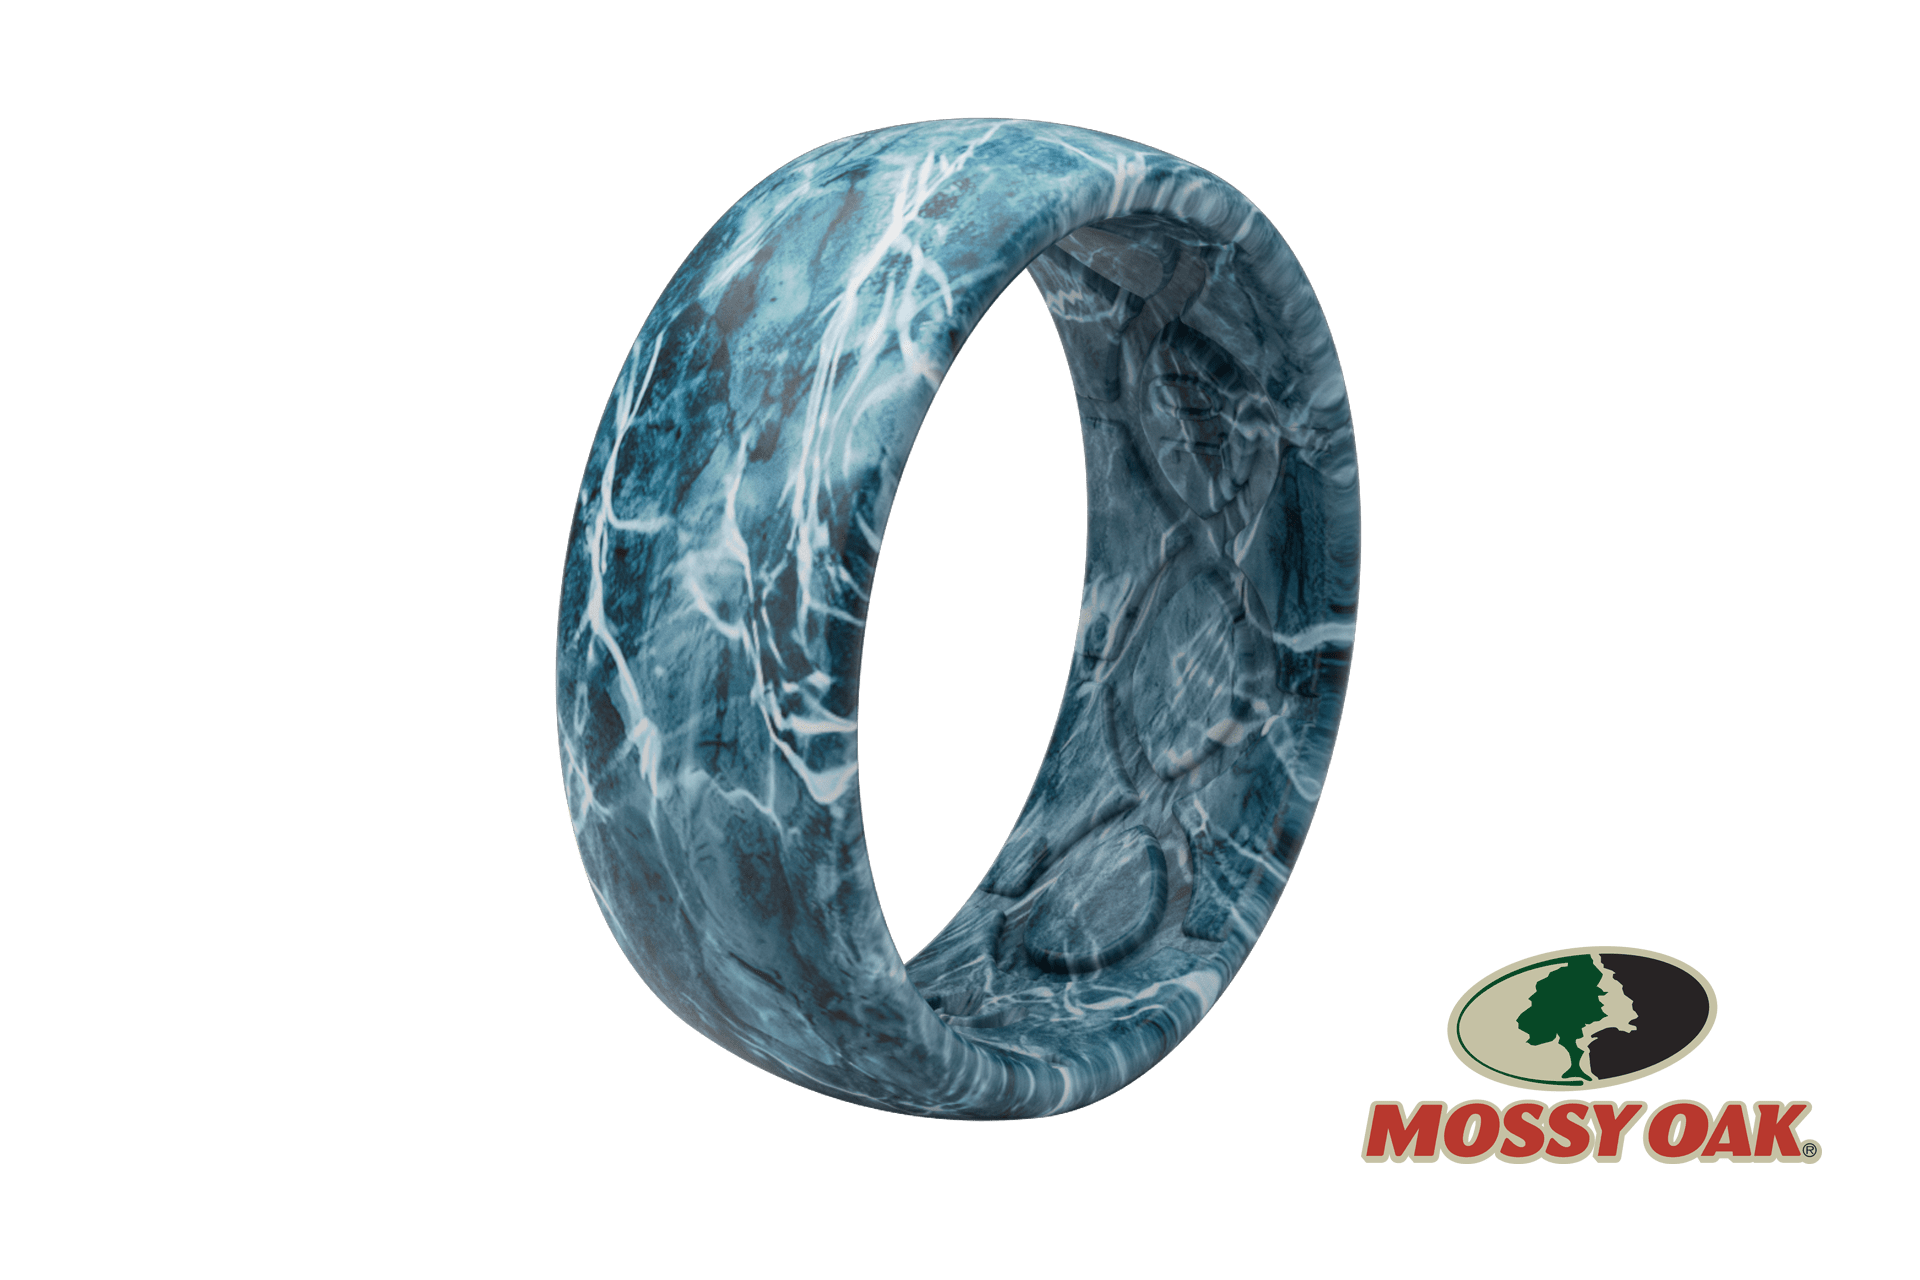 Original Camo Mossy Oak Elements Agua Spindrift Pattern -  viewed from side